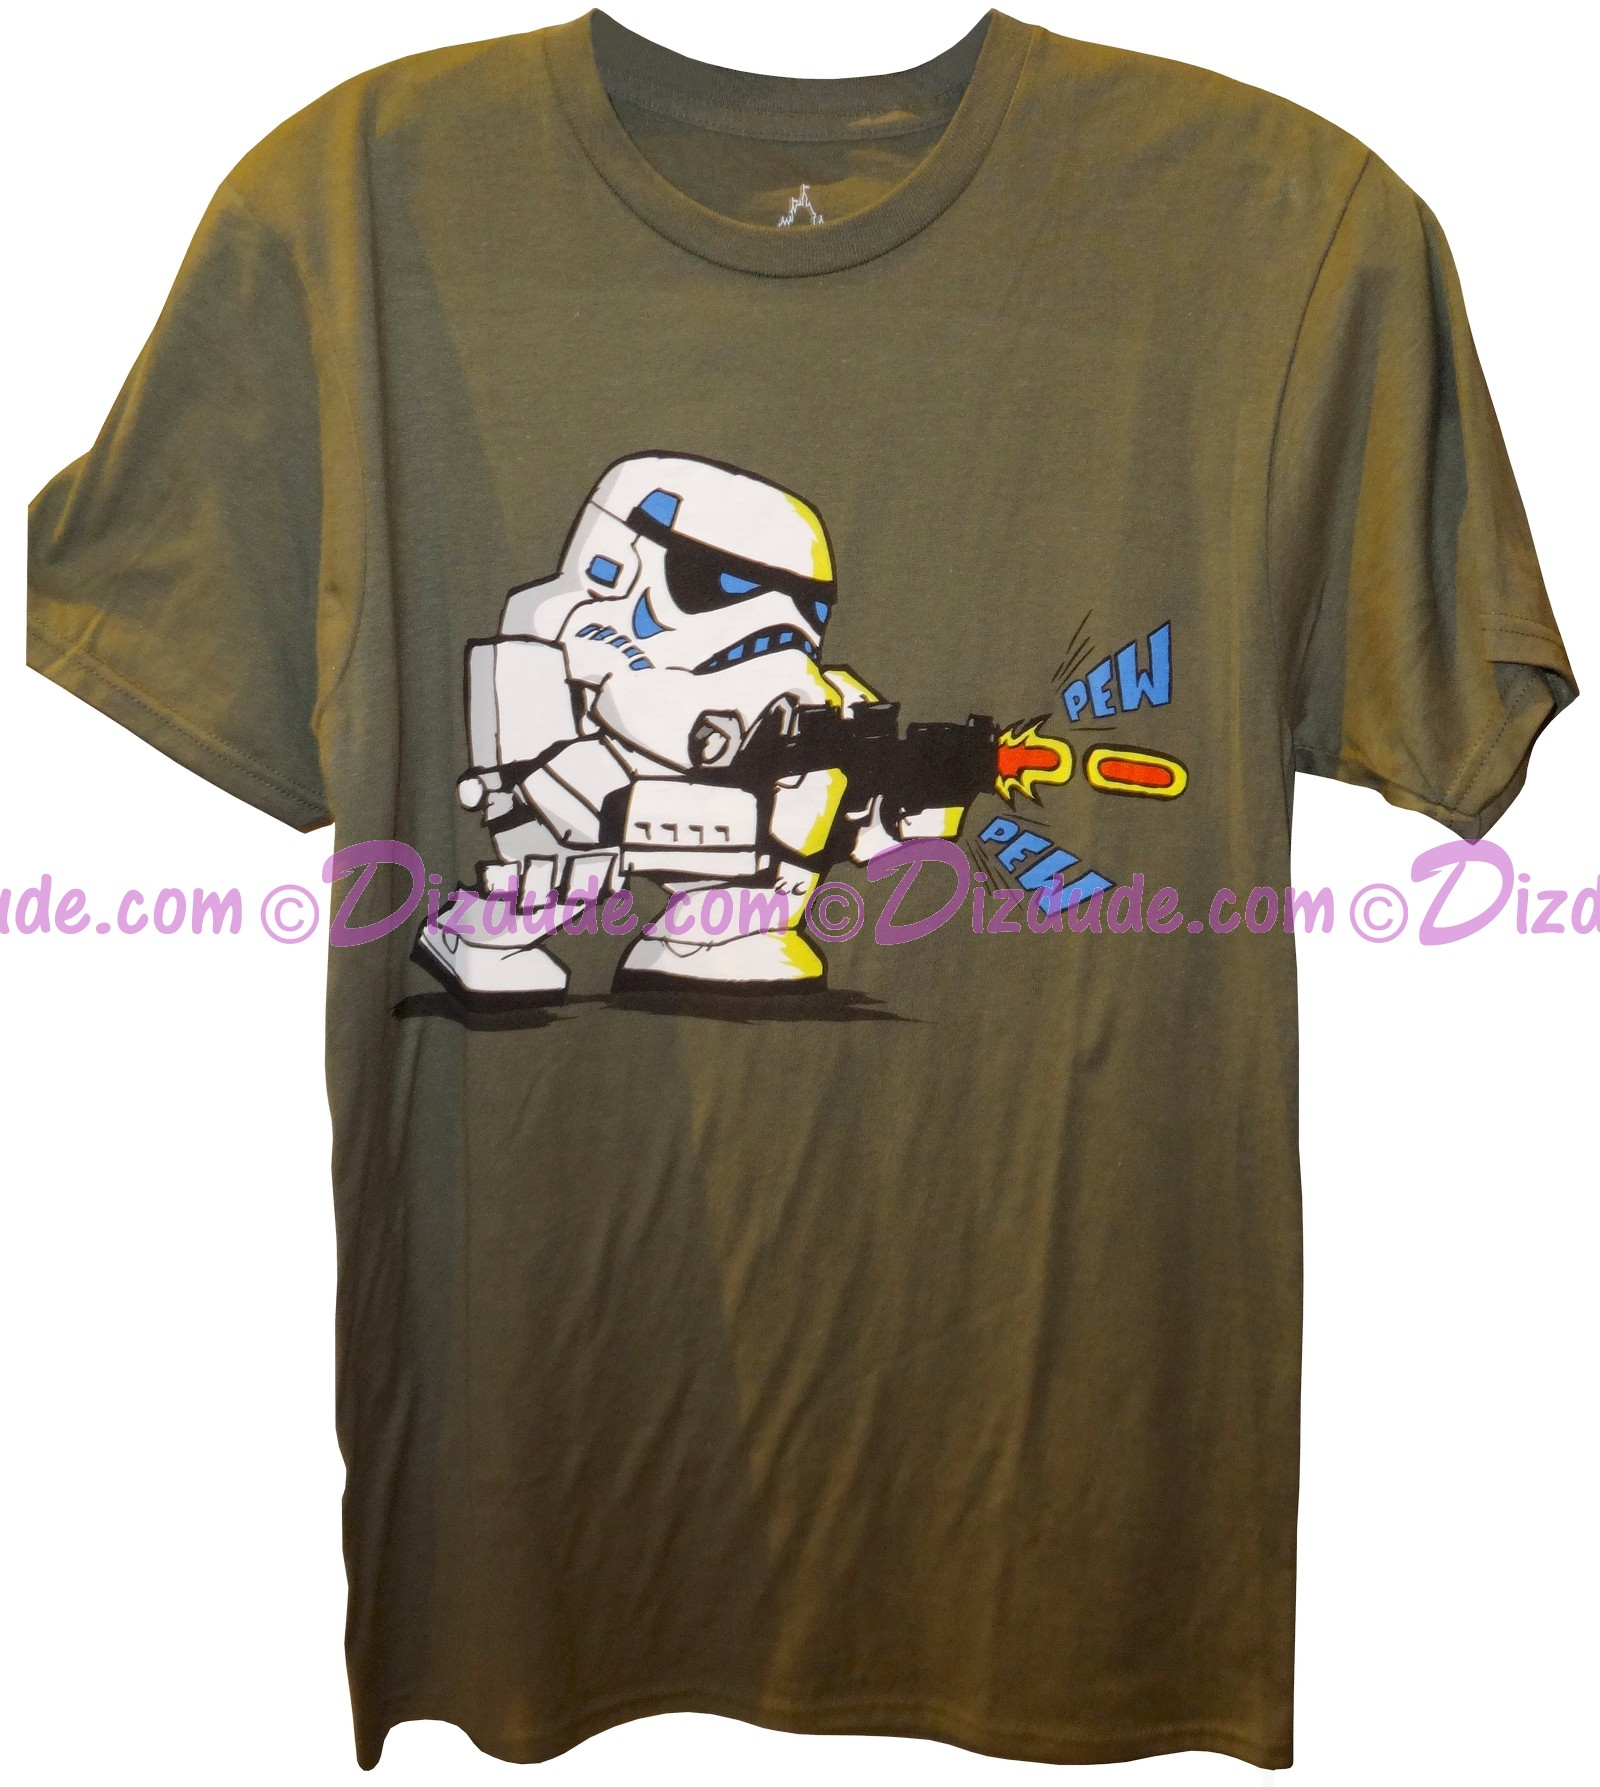 Disney Star Wars Stormtrooper Pew Pew Adult T-Shirt (Tshirt, T shirt or Tee) © Dizdude.com